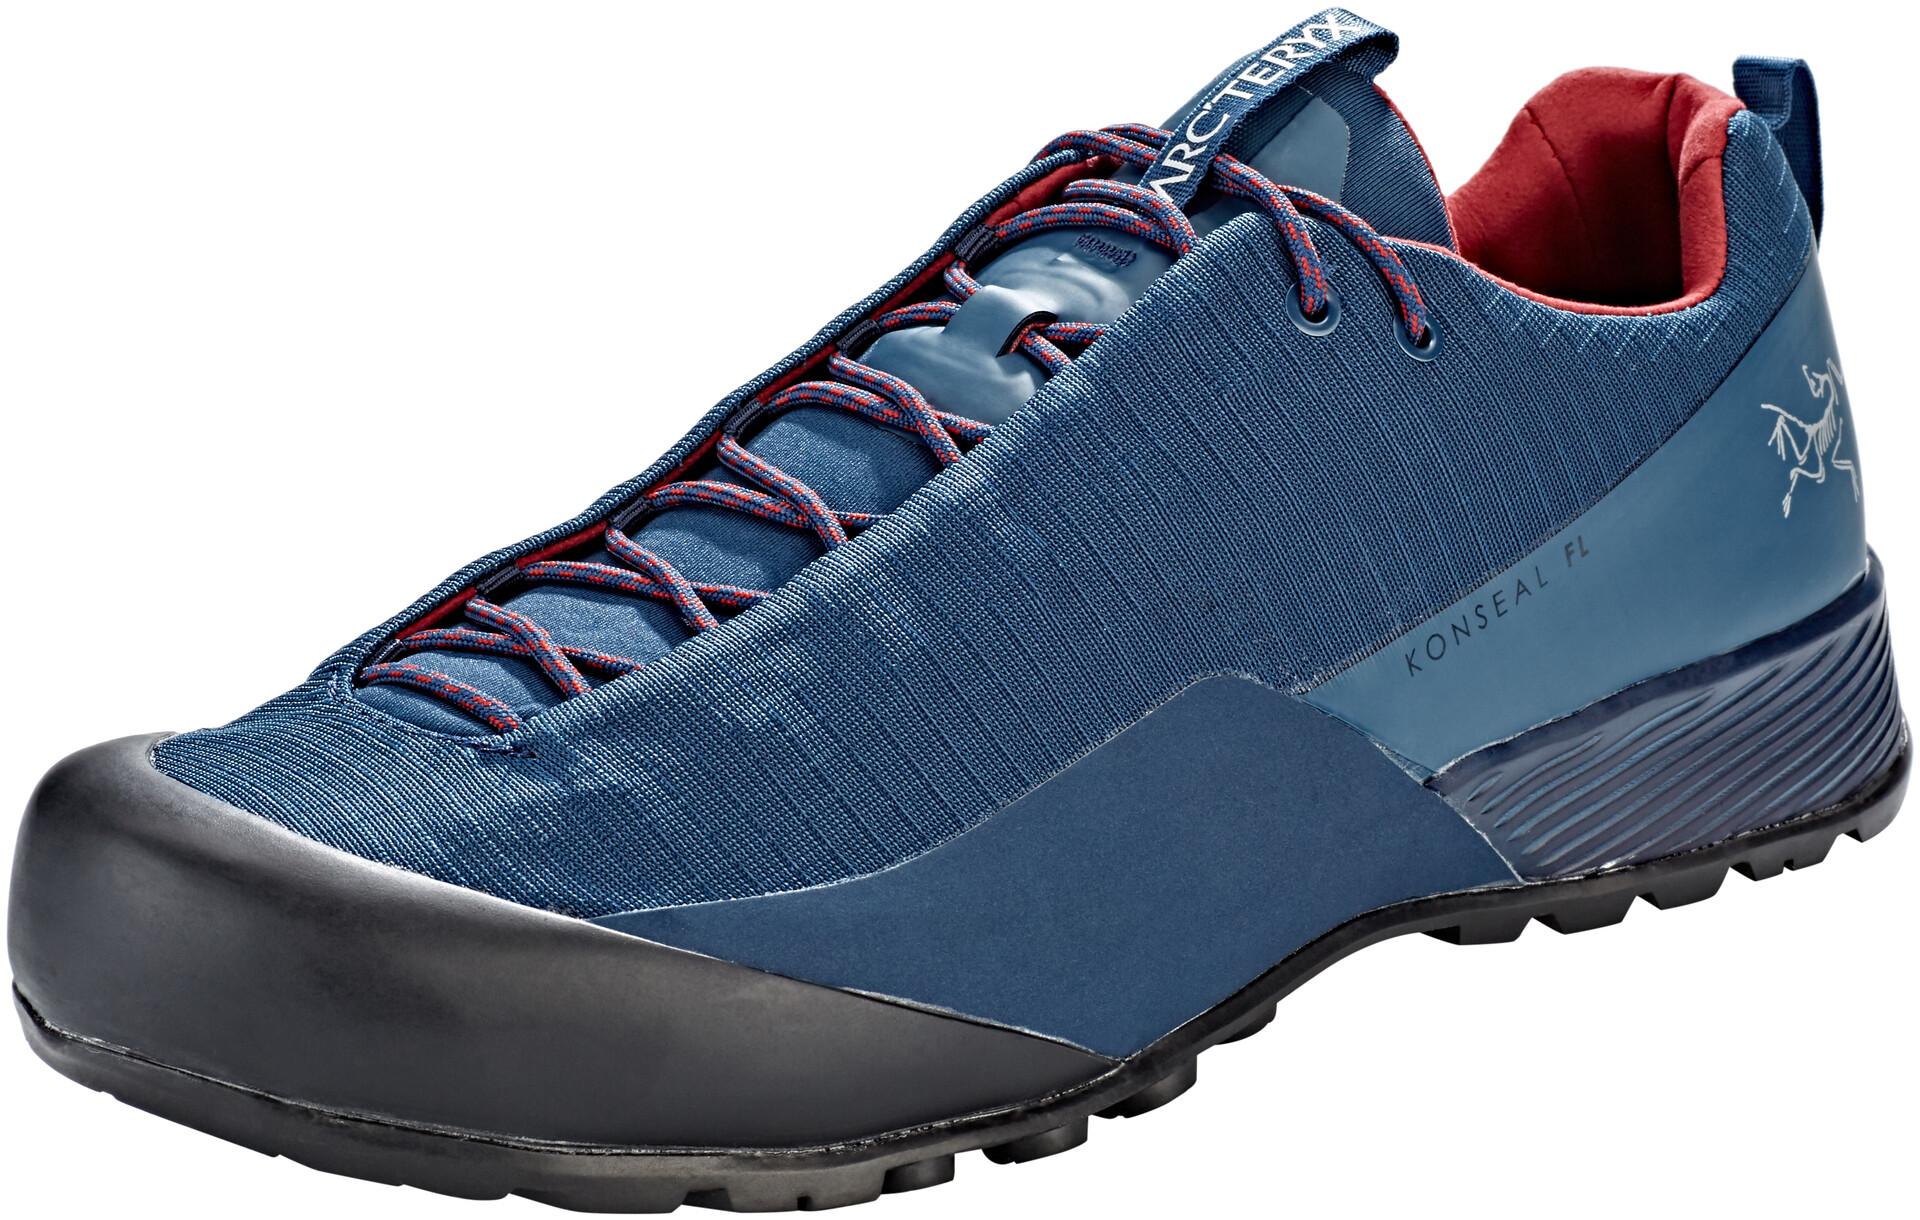 Outdoor Schuhe Arc'teryx Acrux 2 AR Mountaineering Herren